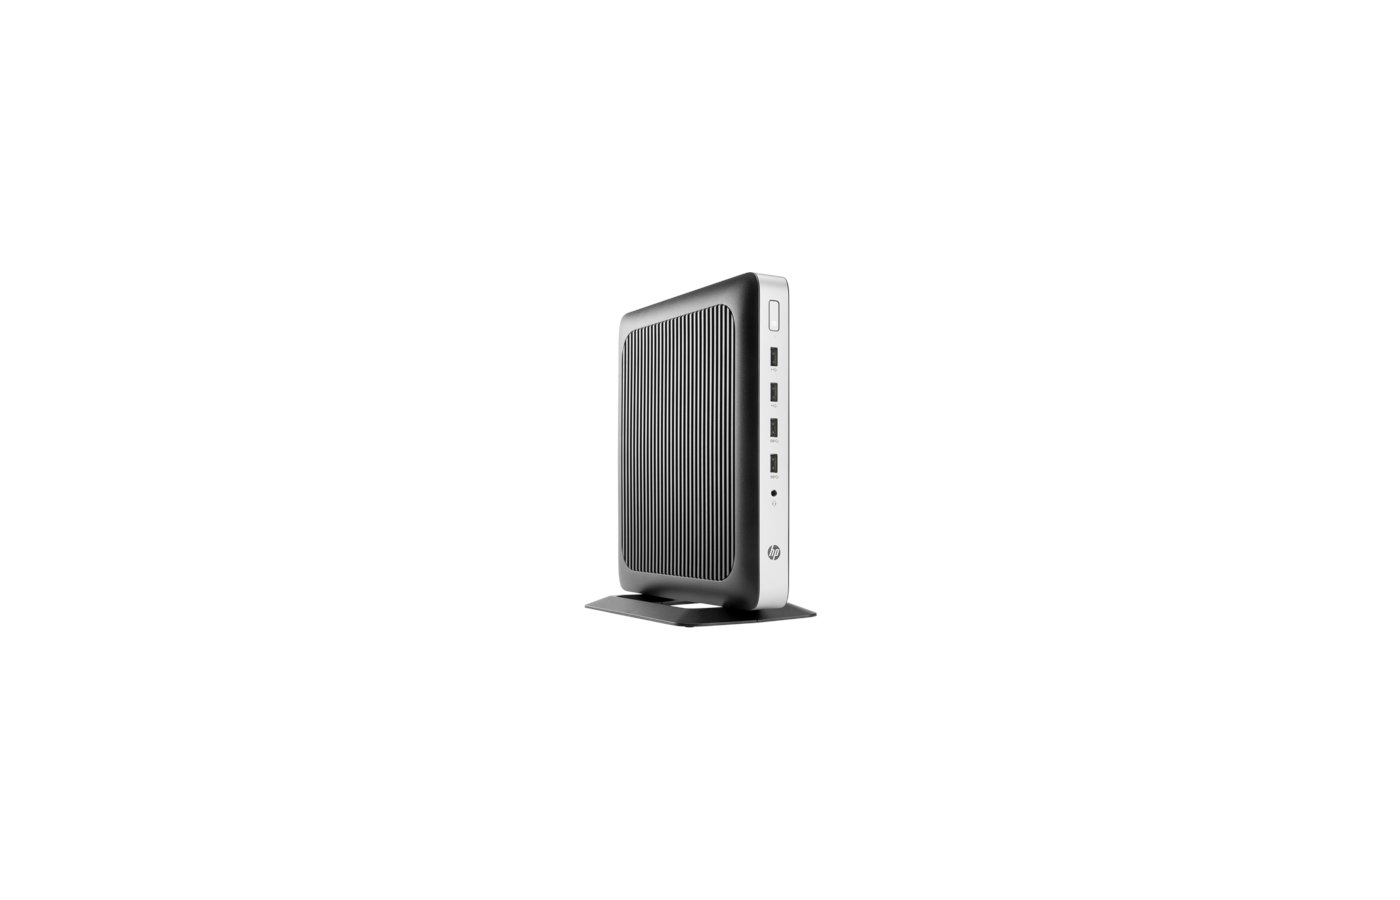 Системный блок HP T630 /X4X16AA/